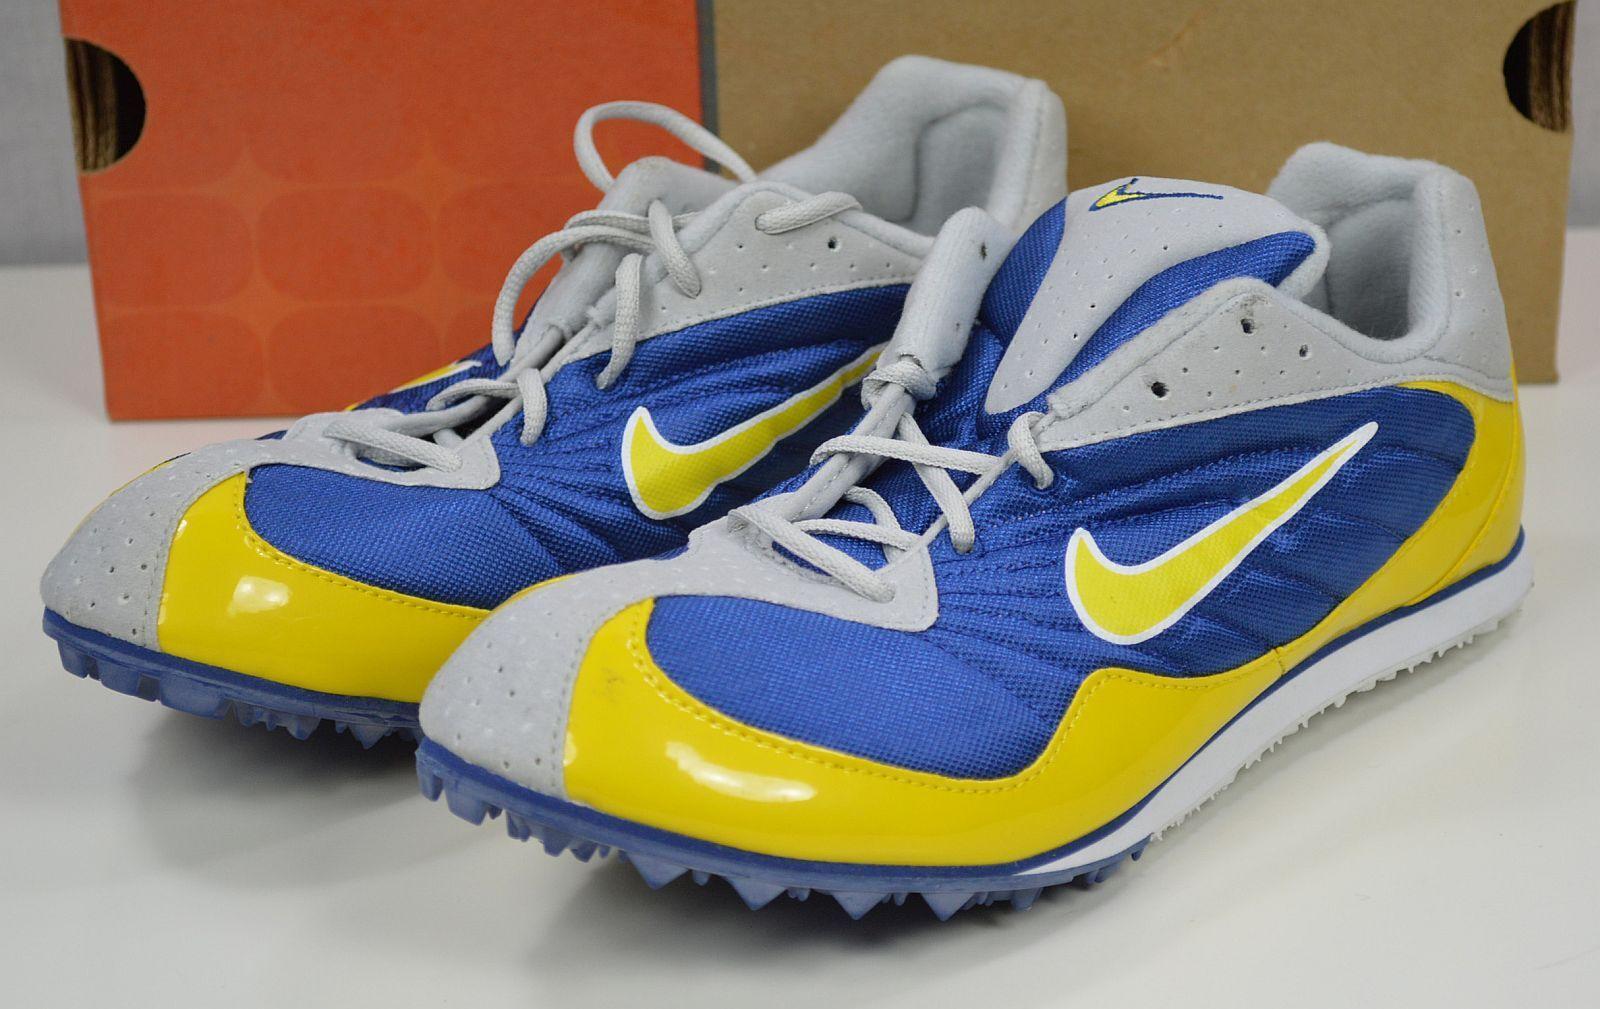 Nike WMNS Zoom Jana Damen Track Spike EU 42 Laufschuhe Sportschuhe sale 12041701